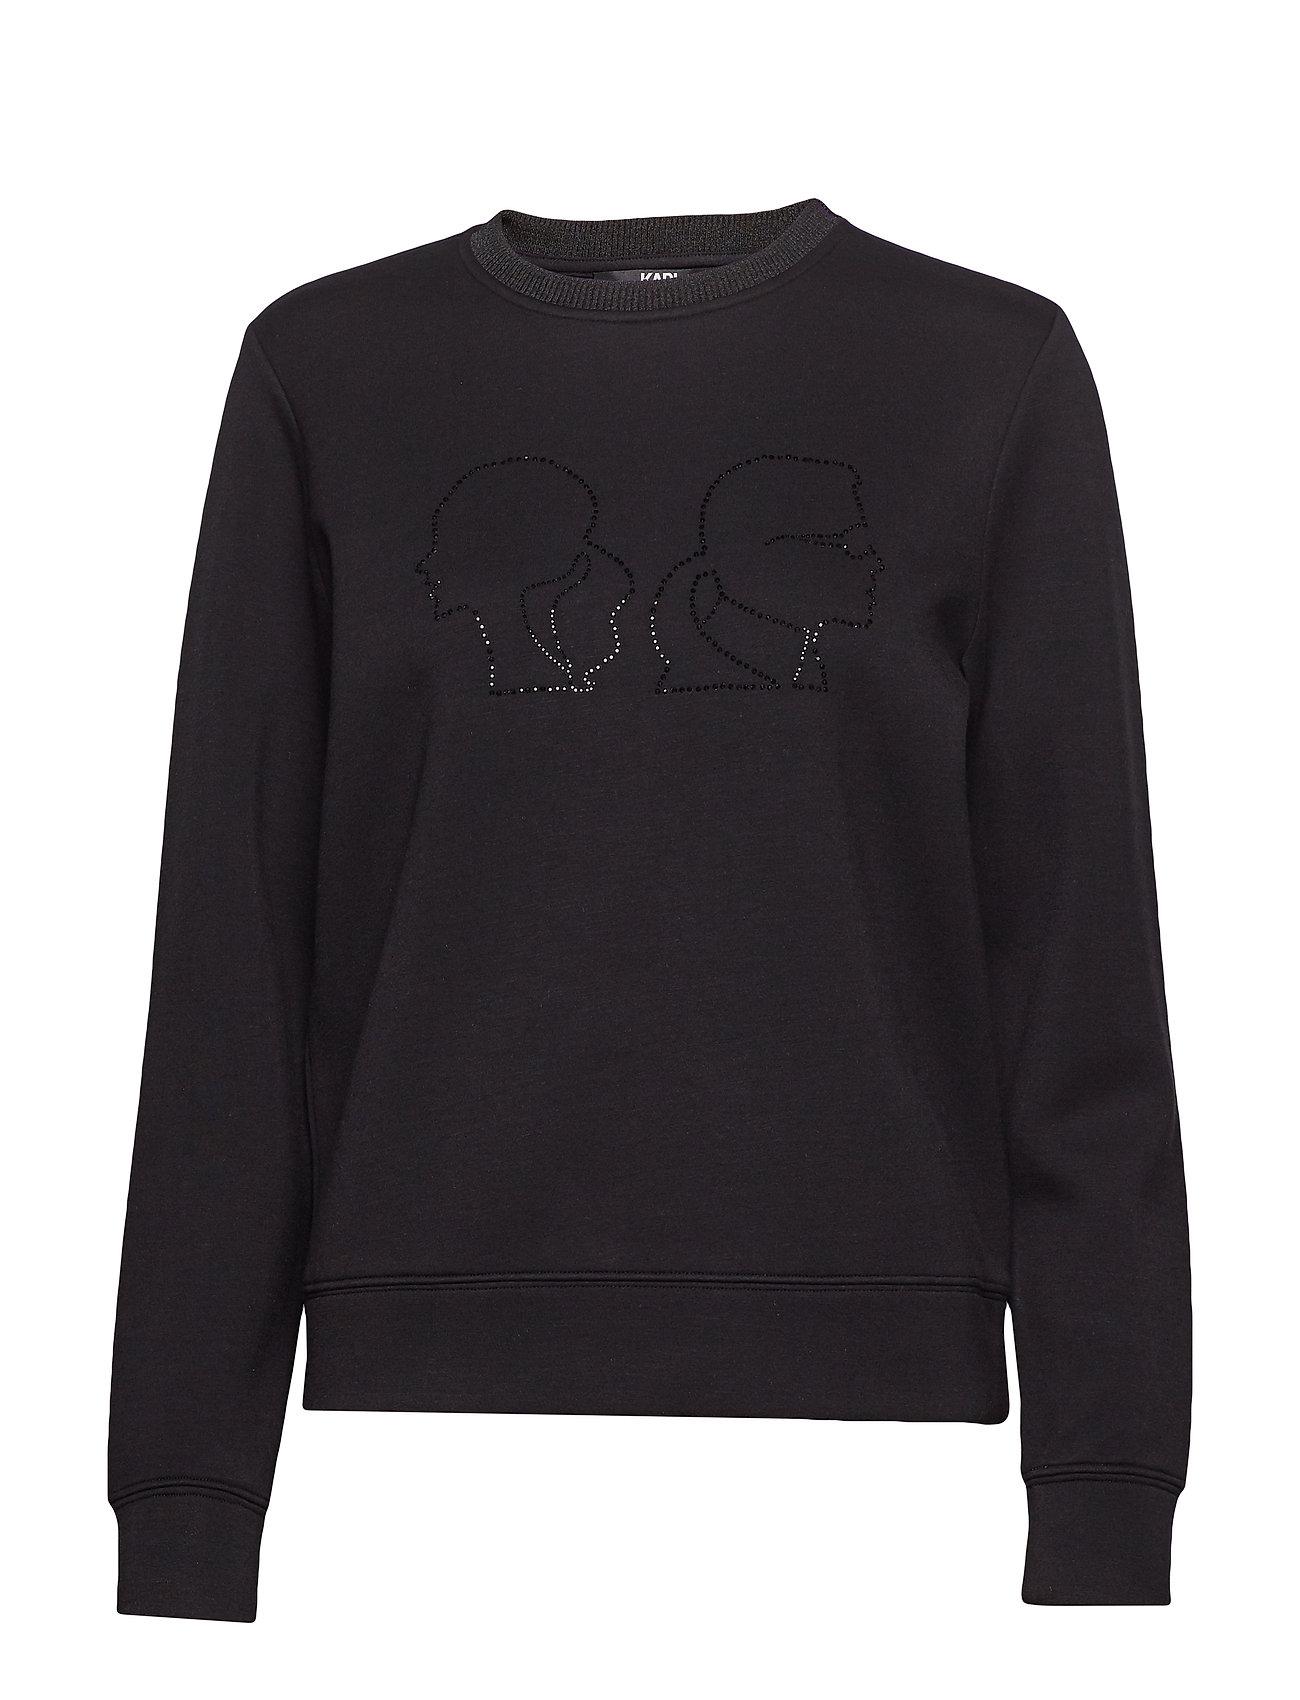 Karl Lagerfeld Karl X Olivia Profile Sweat - 999 BLACK